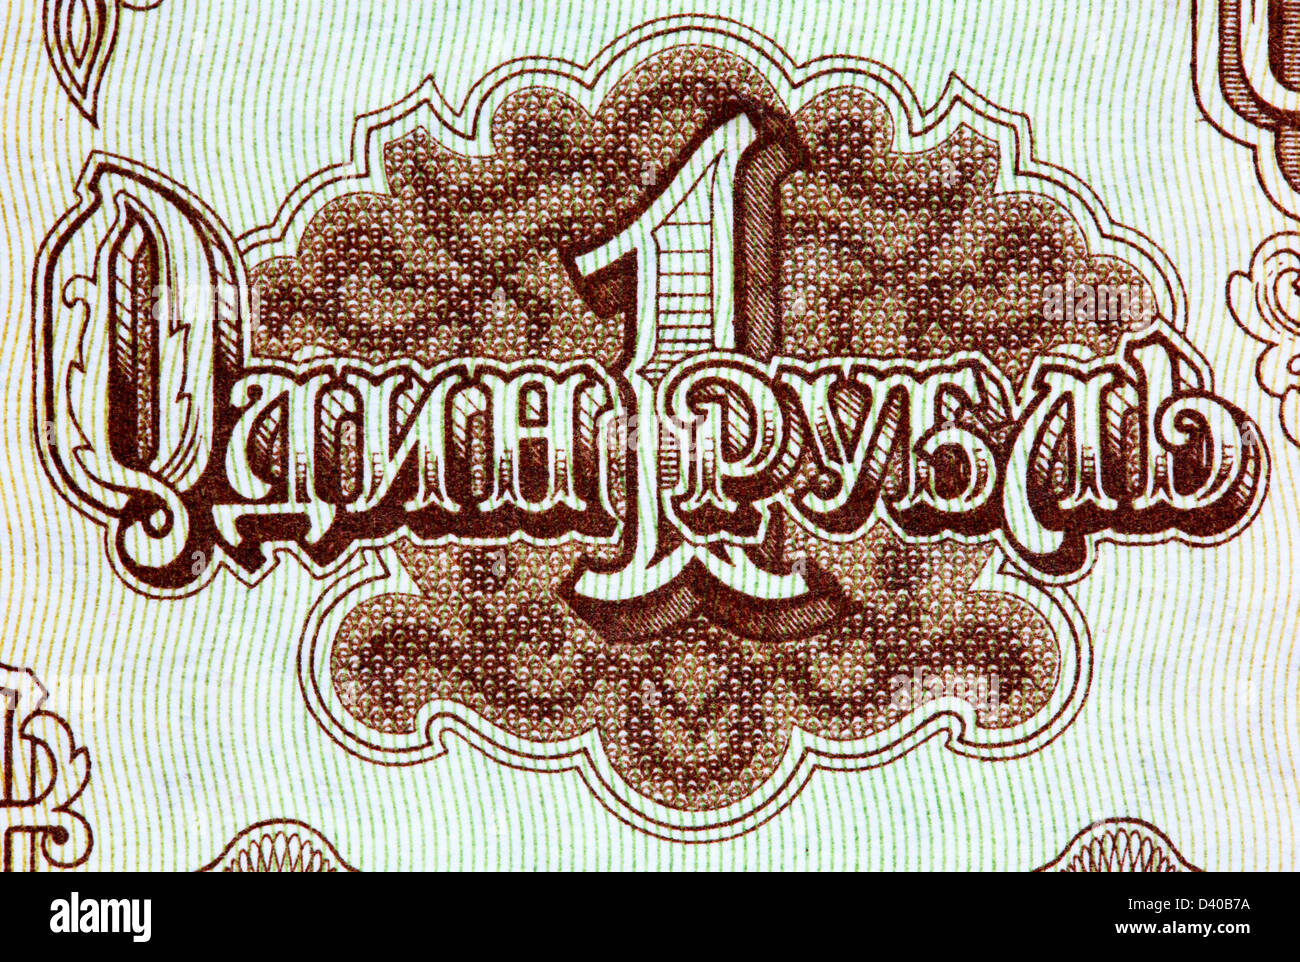 Número 1 billetes de 1 rublo, Rusia, 1961 Imagen De Stock